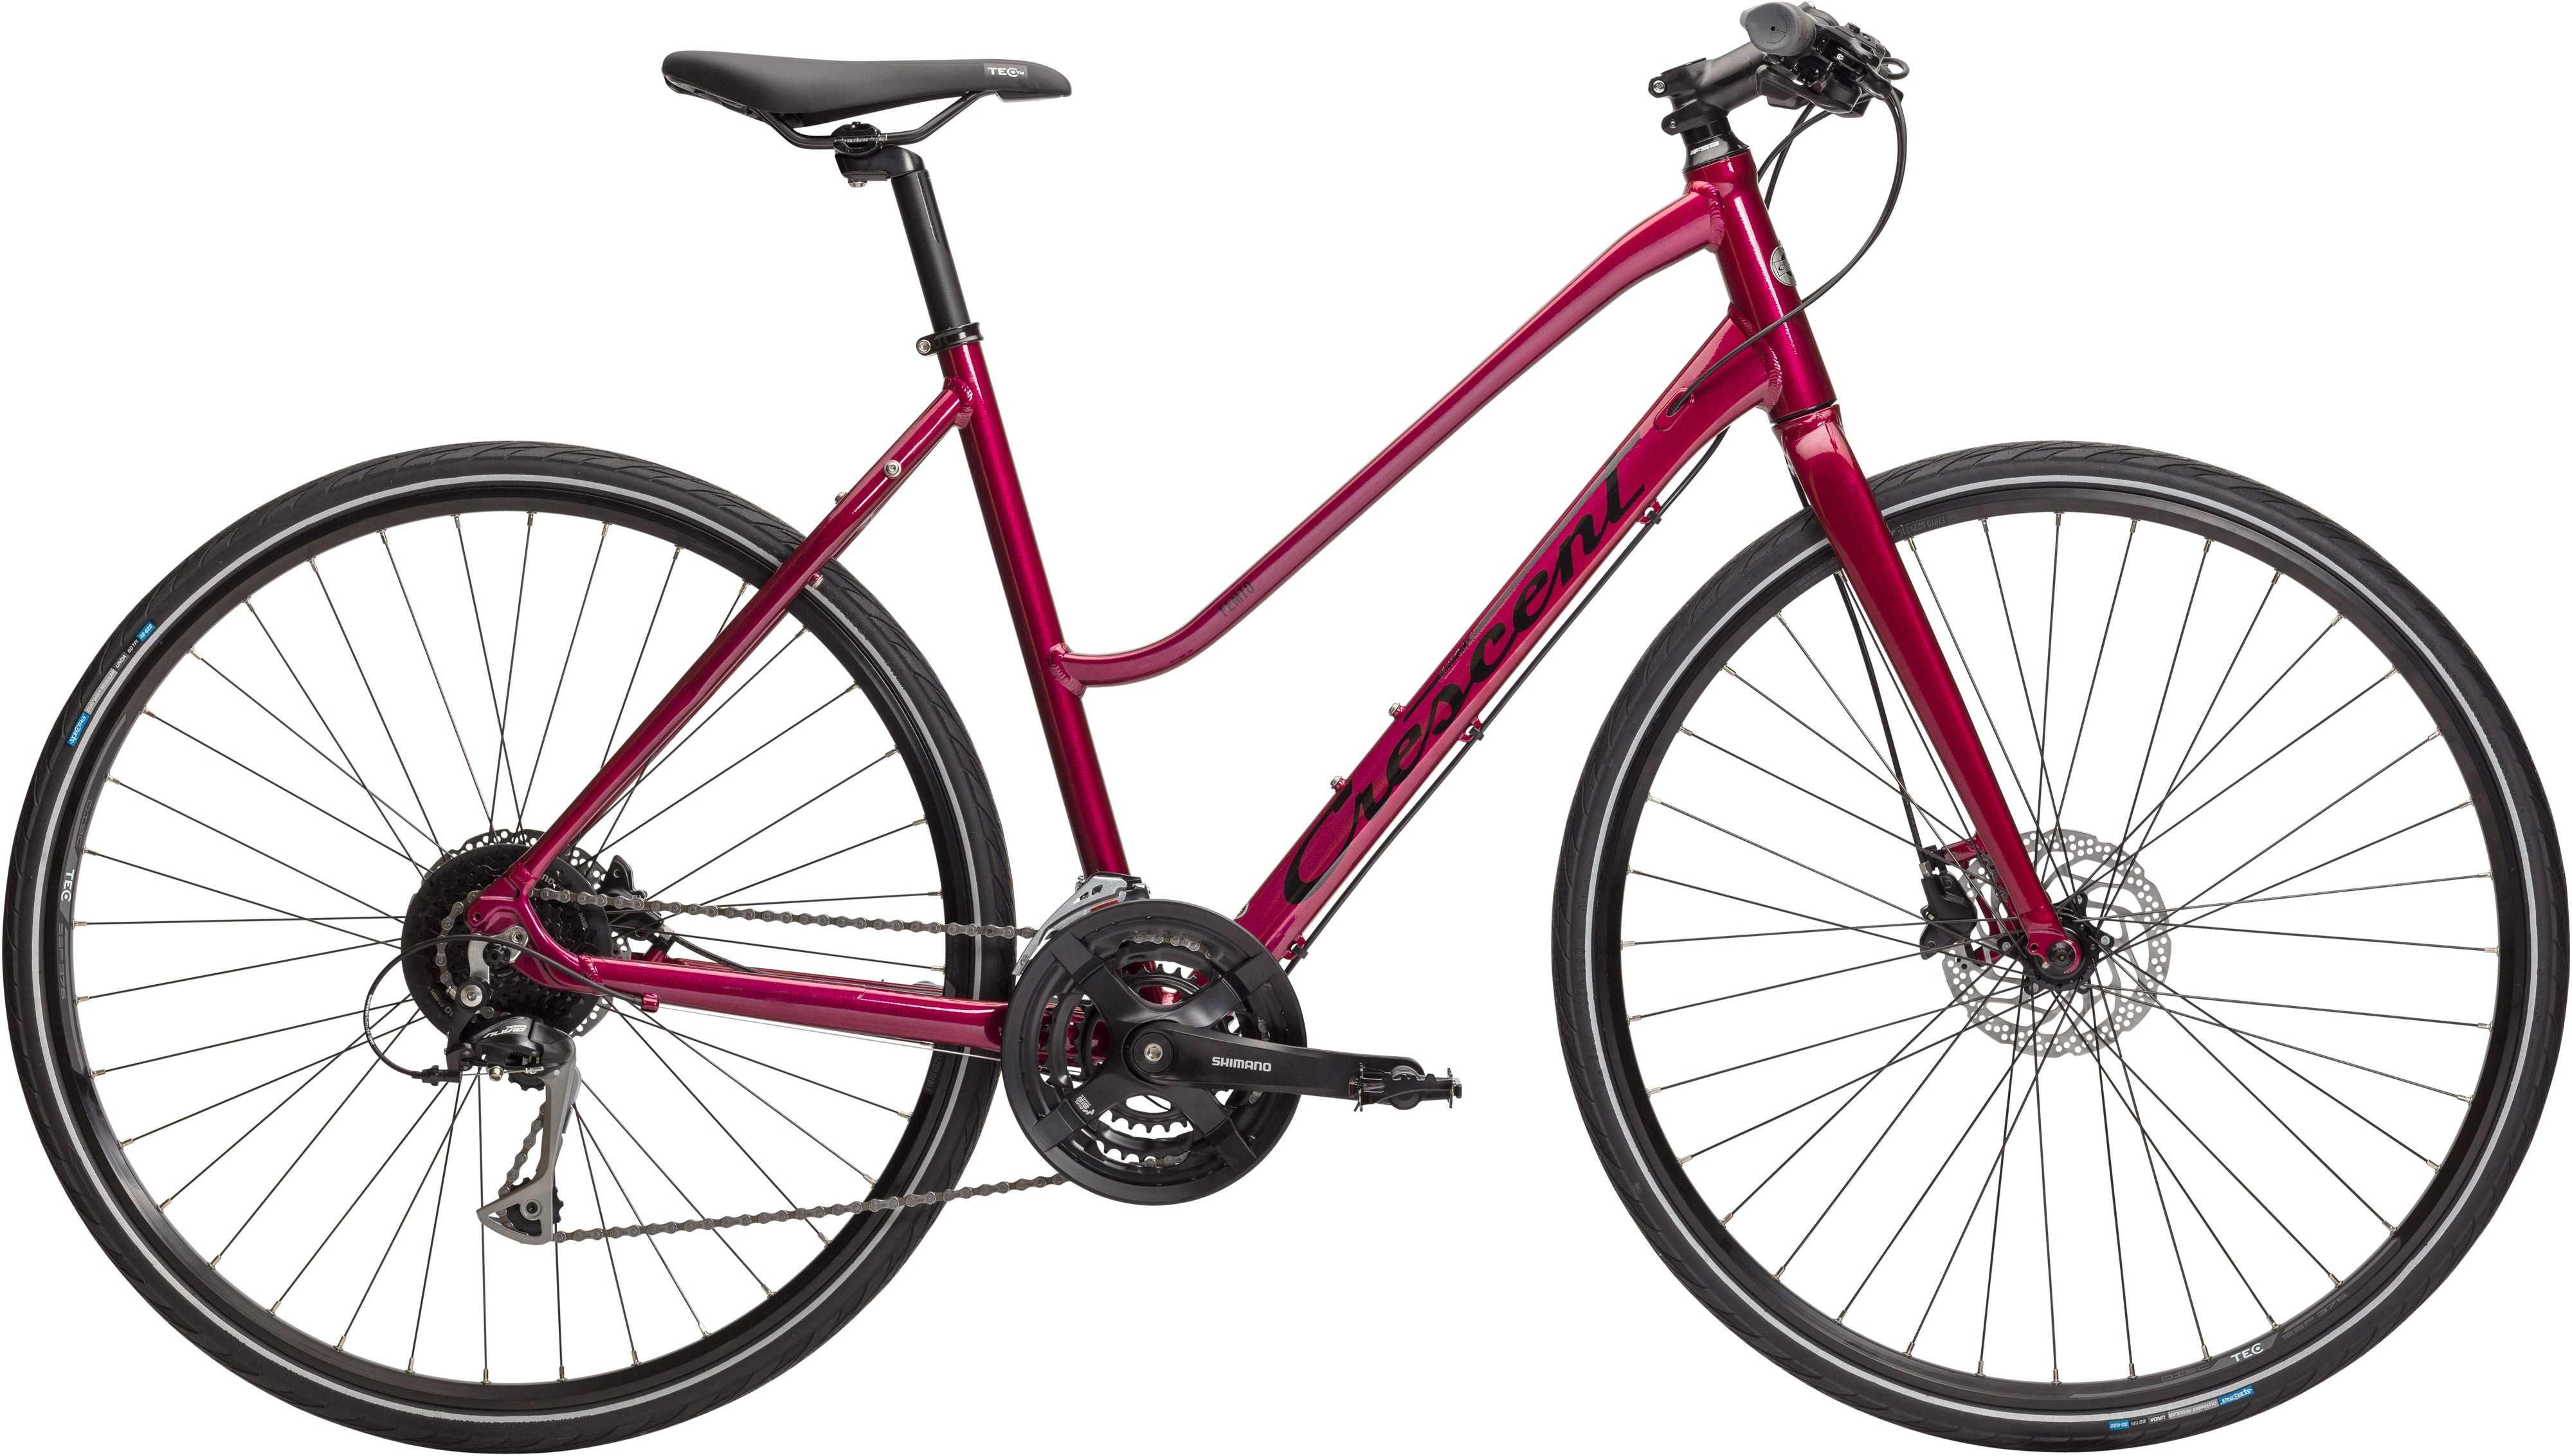 Crescent Femto röd | City-cykler